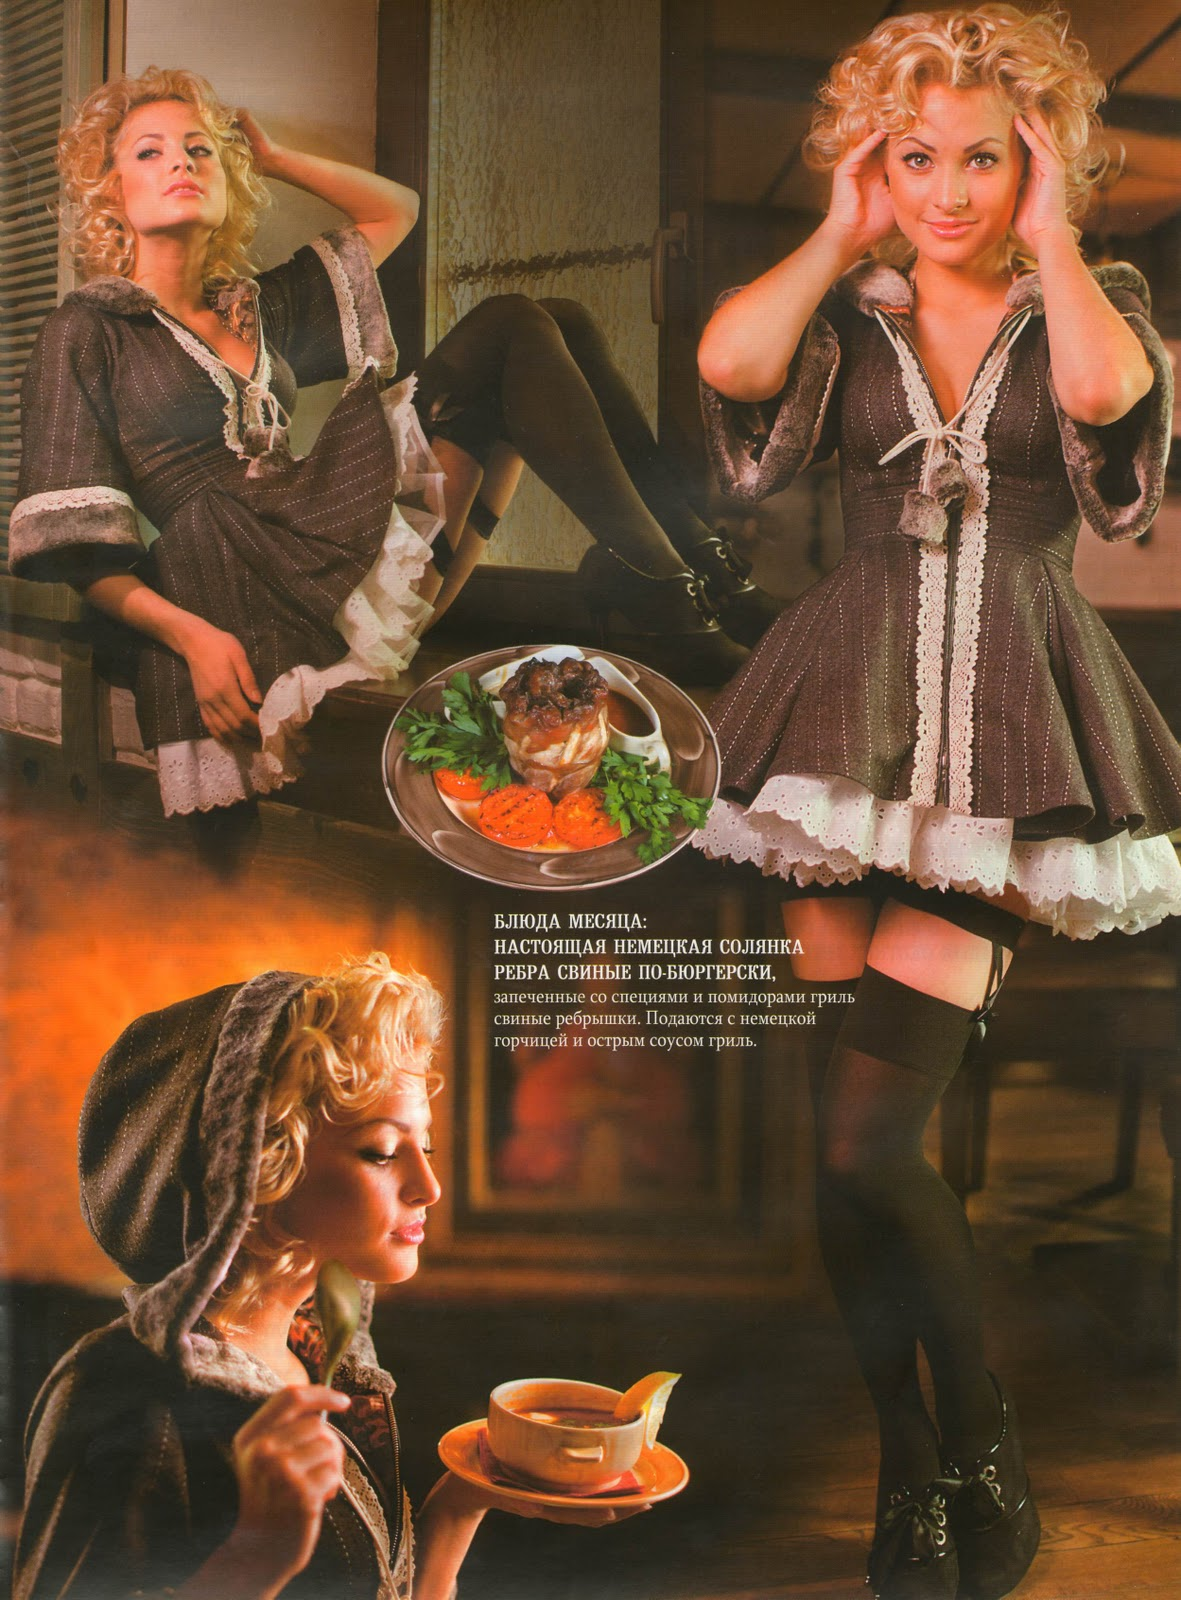 Юлия зимина фото в журнале 19 фотография